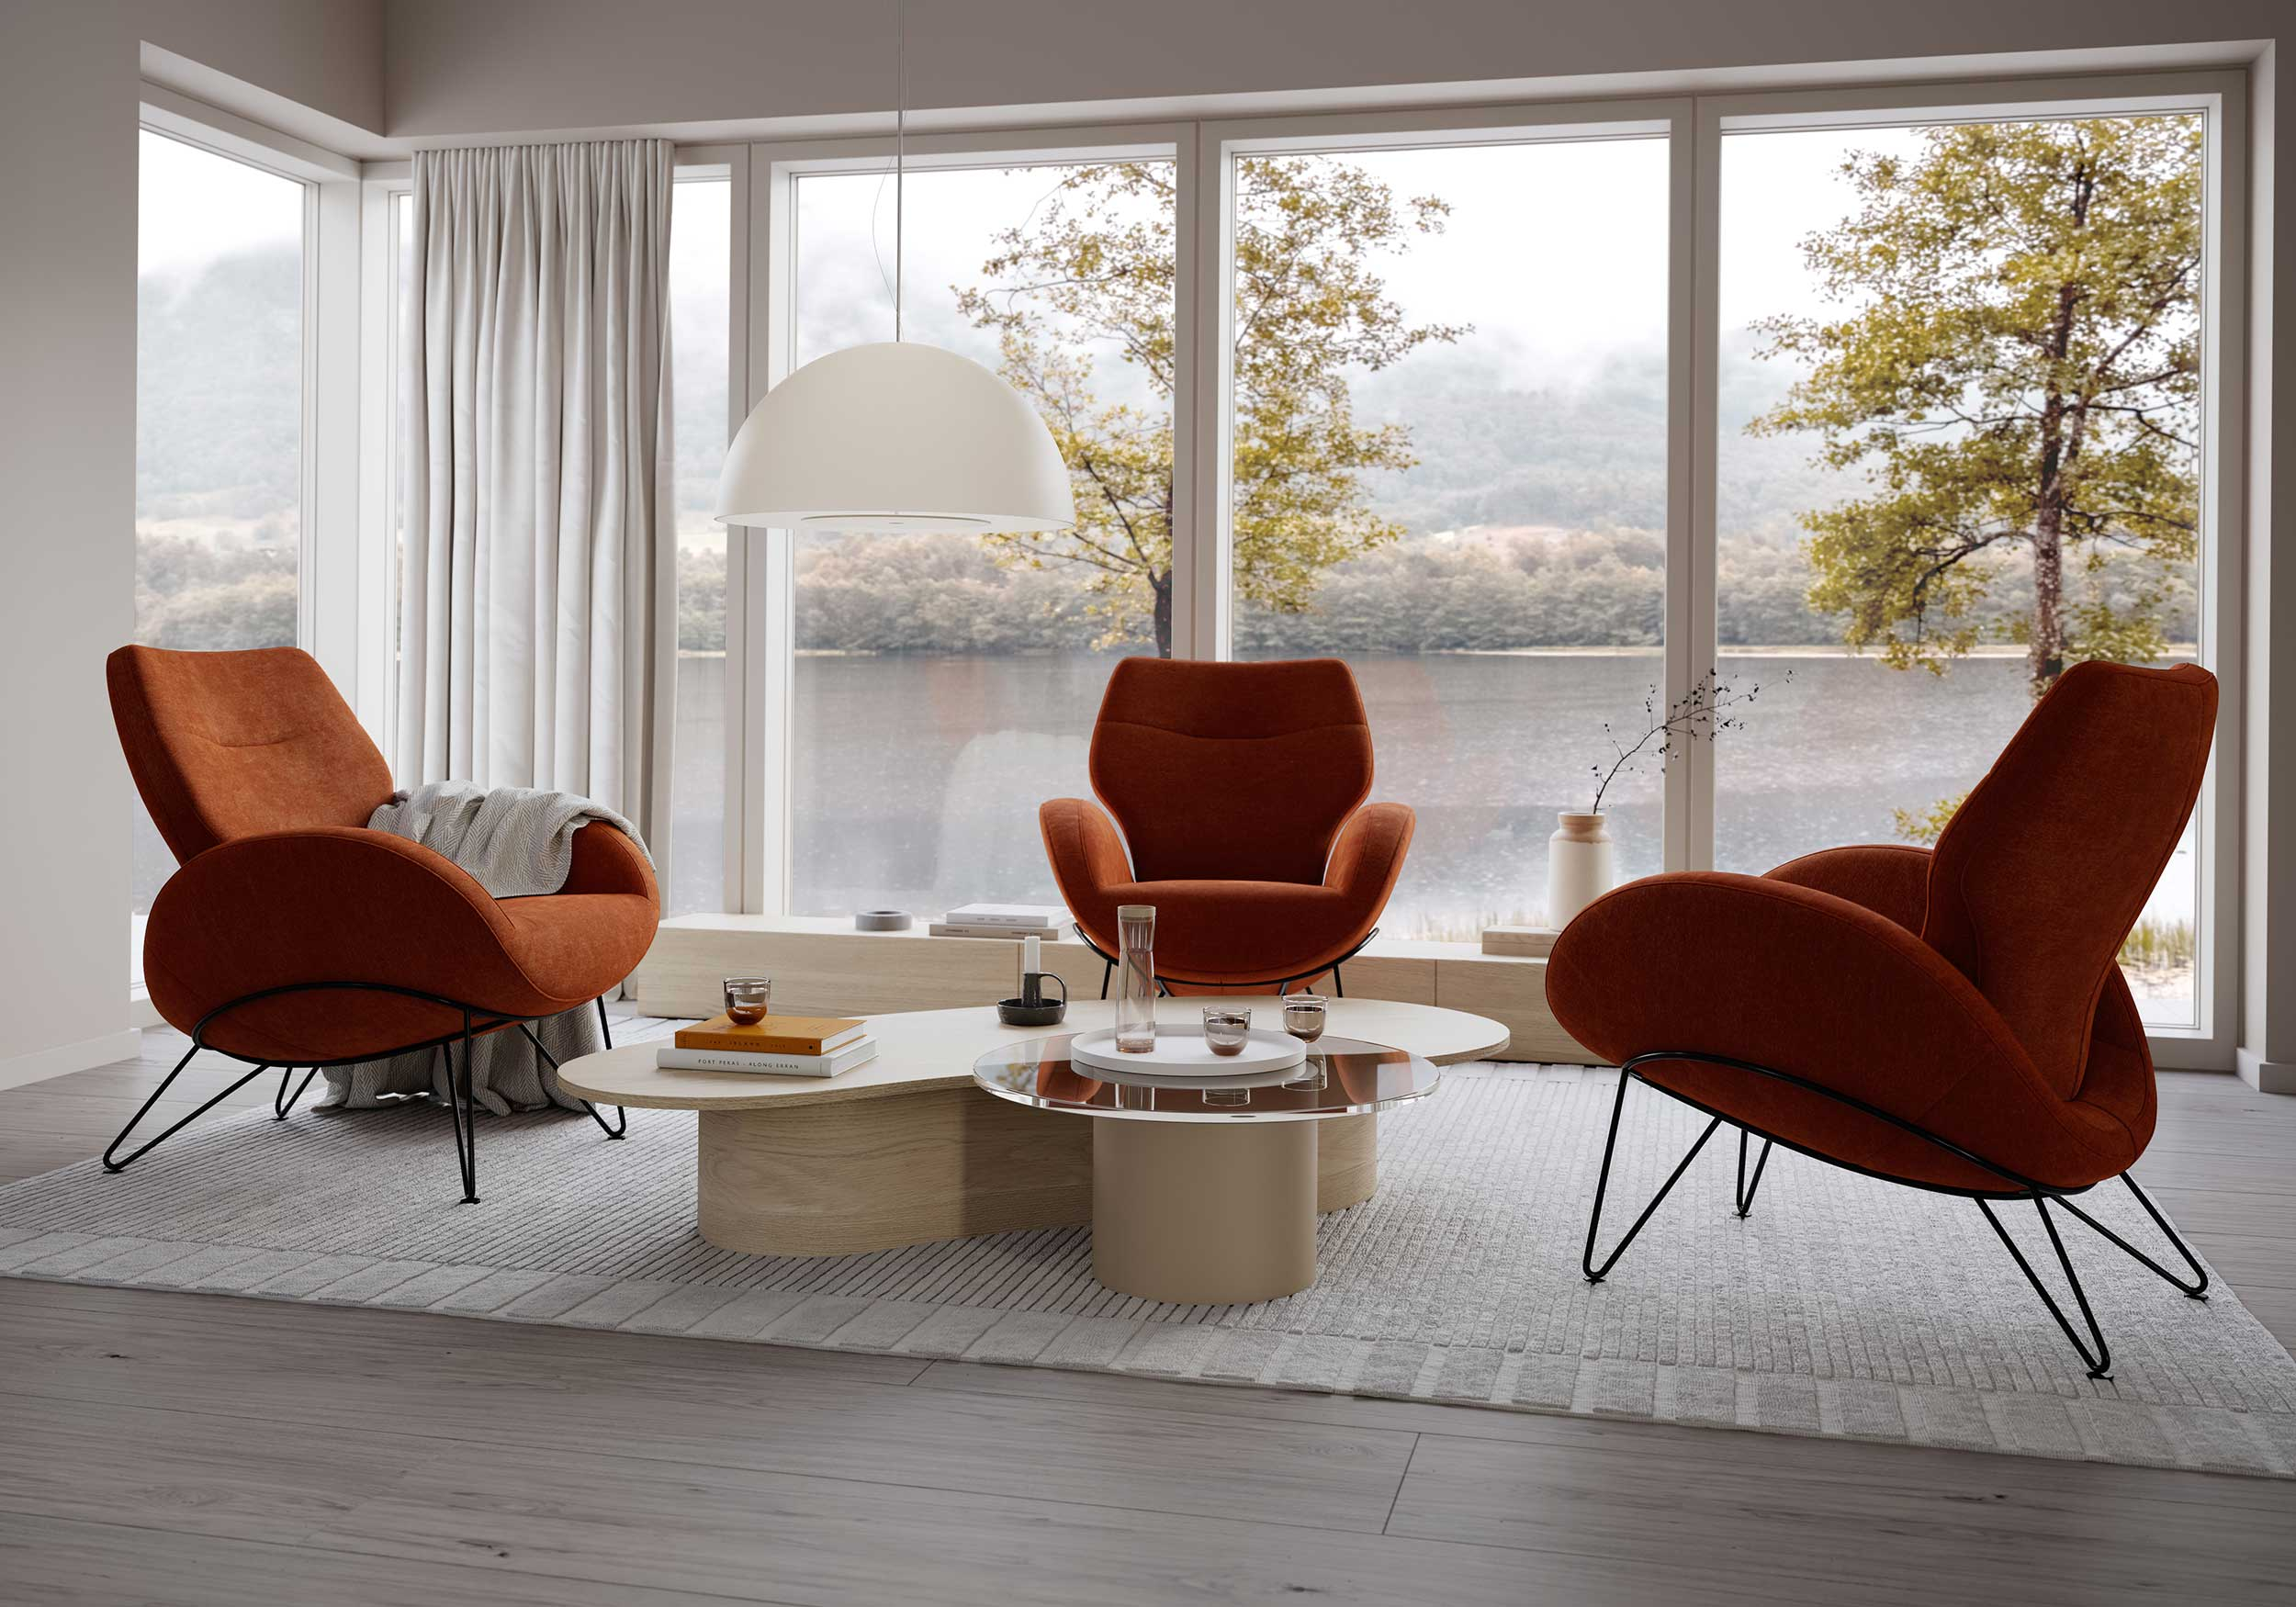 CGI-based furniture